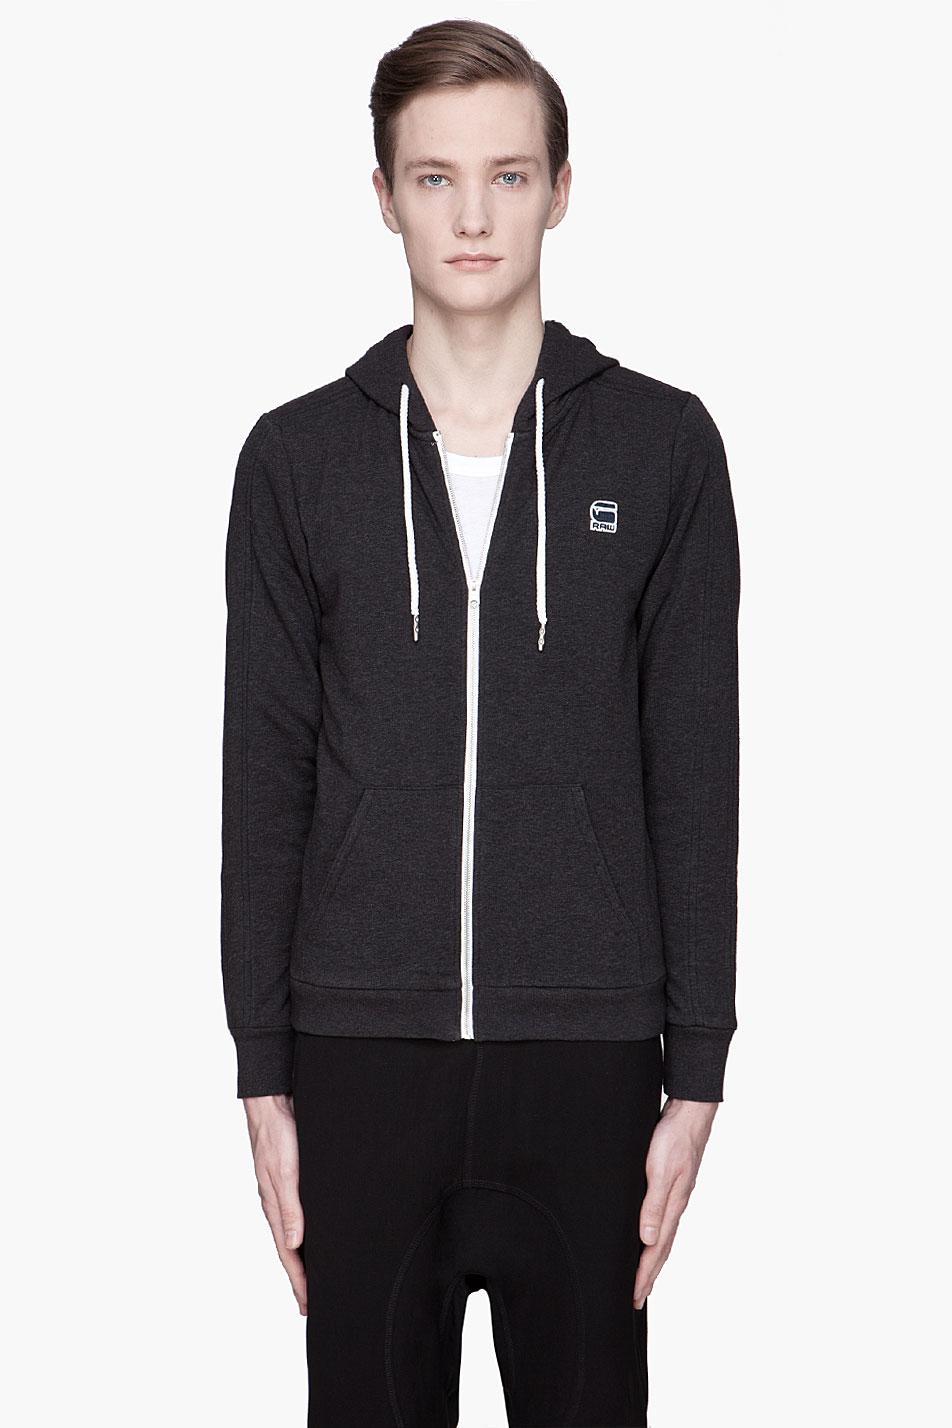 g star raw heather black carvell hoodie in black for men. Black Bedroom Furniture Sets. Home Design Ideas